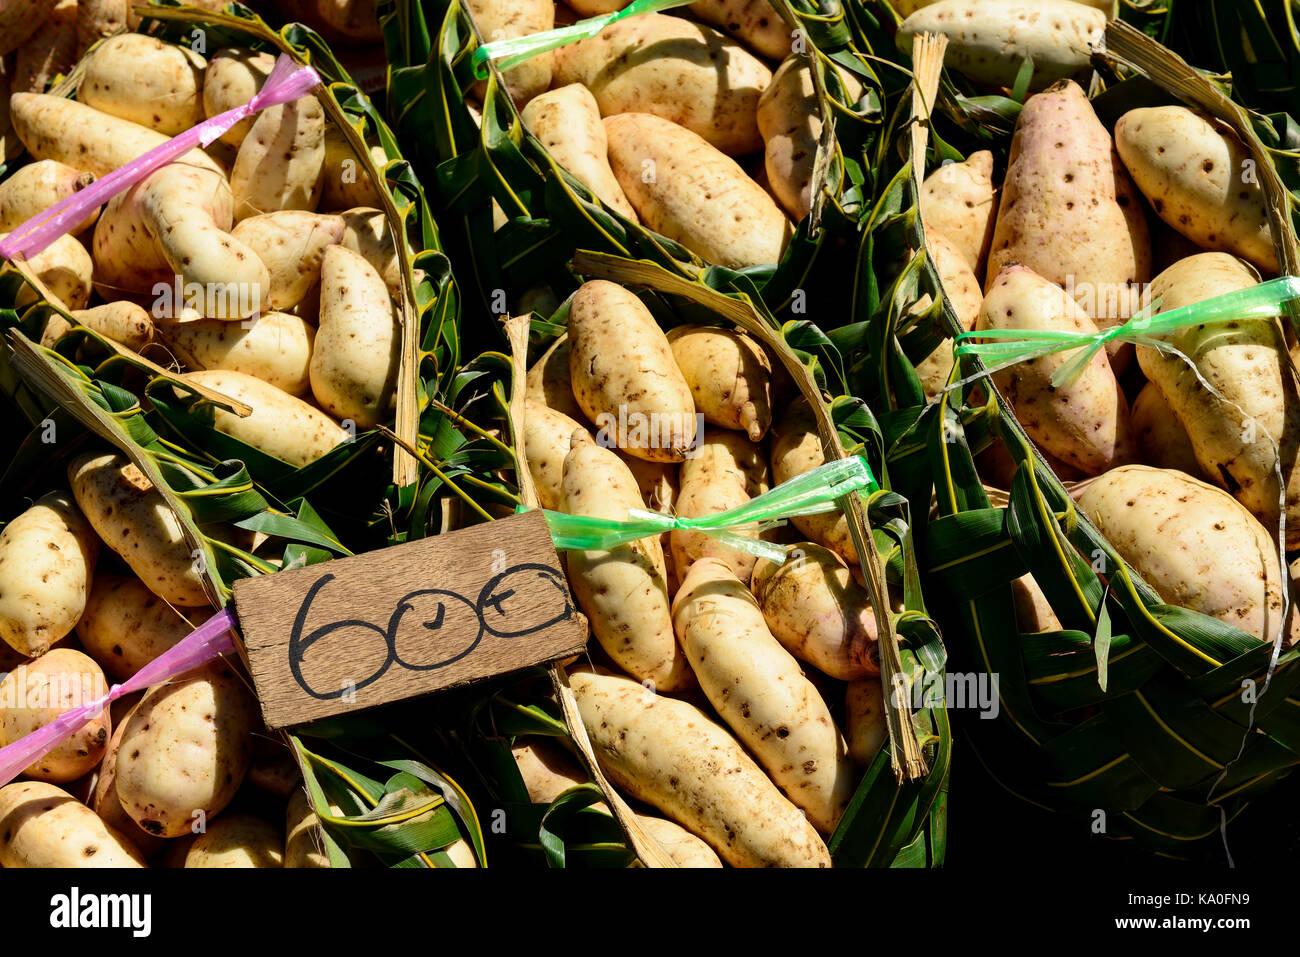 Potatoes on the market in Port Vila, Island of Efate, Vanuatu, South Sea, Oceania - Stock Image